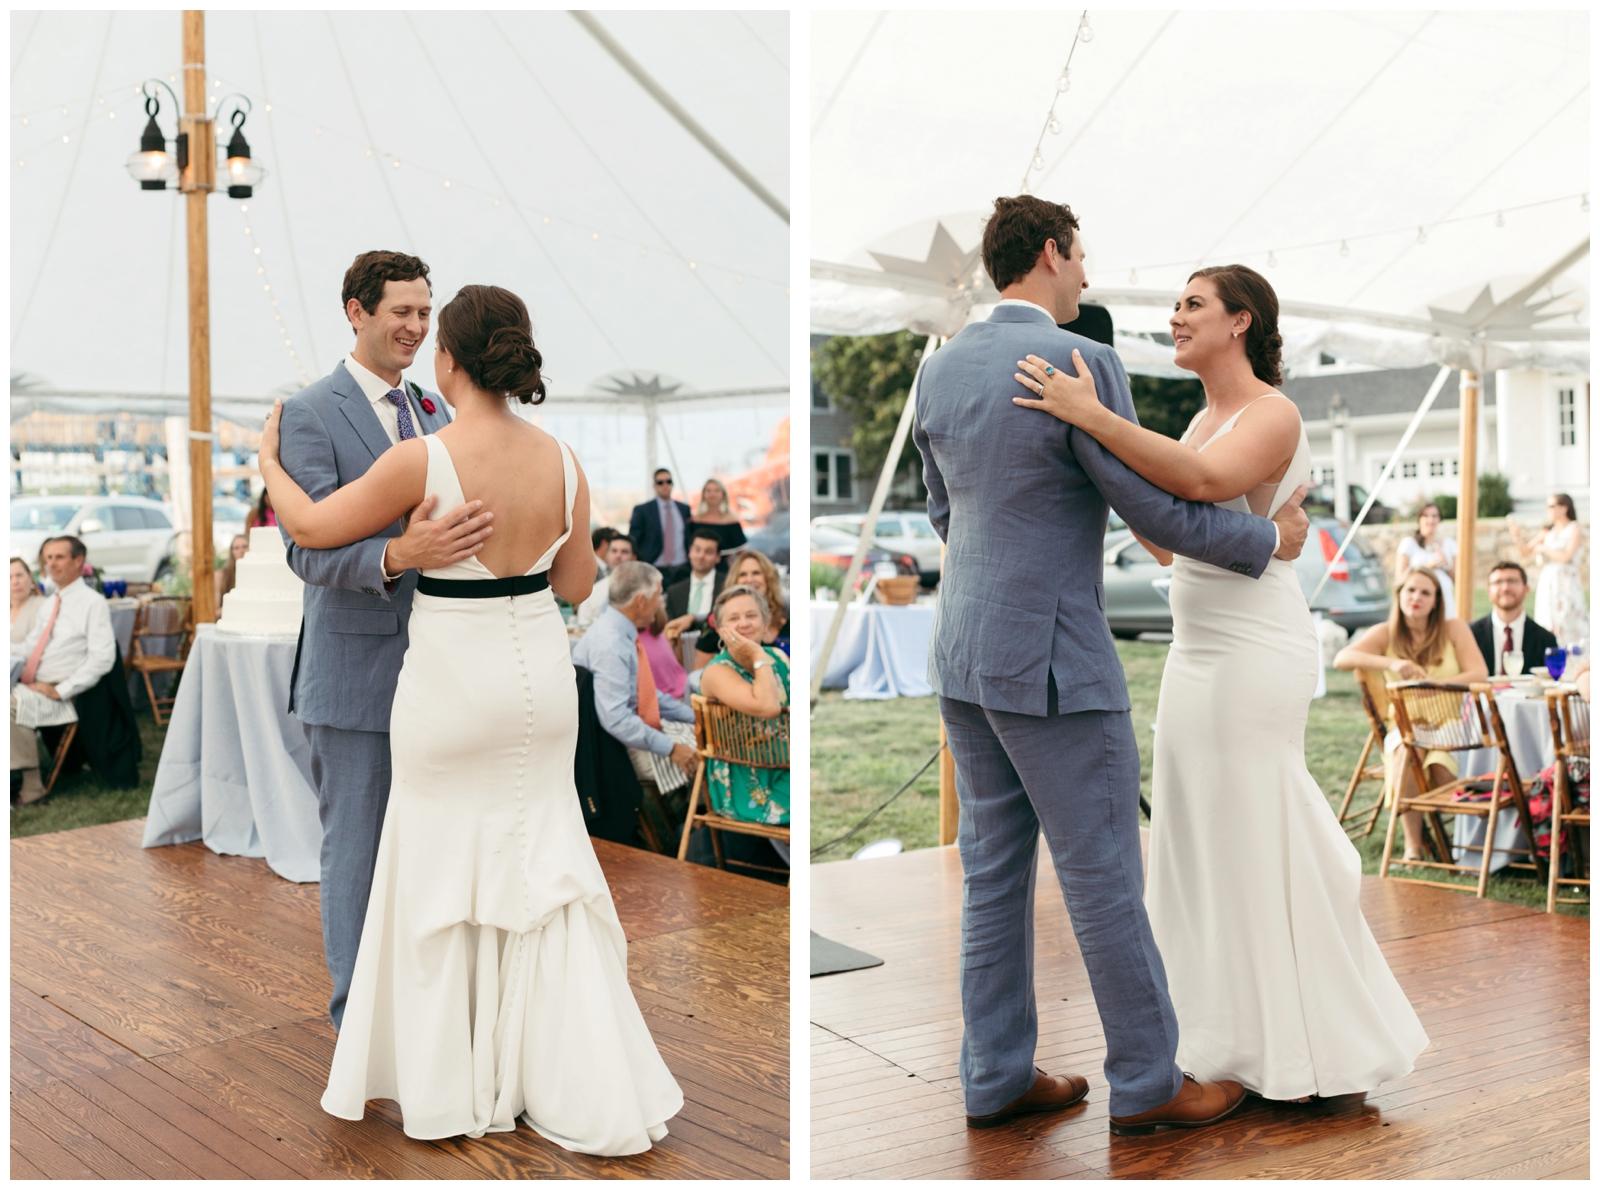 Bailey-Q-Photo-Backyard-Wedding-South-Shore-Boston-Wedding-Photographer-095.jpg